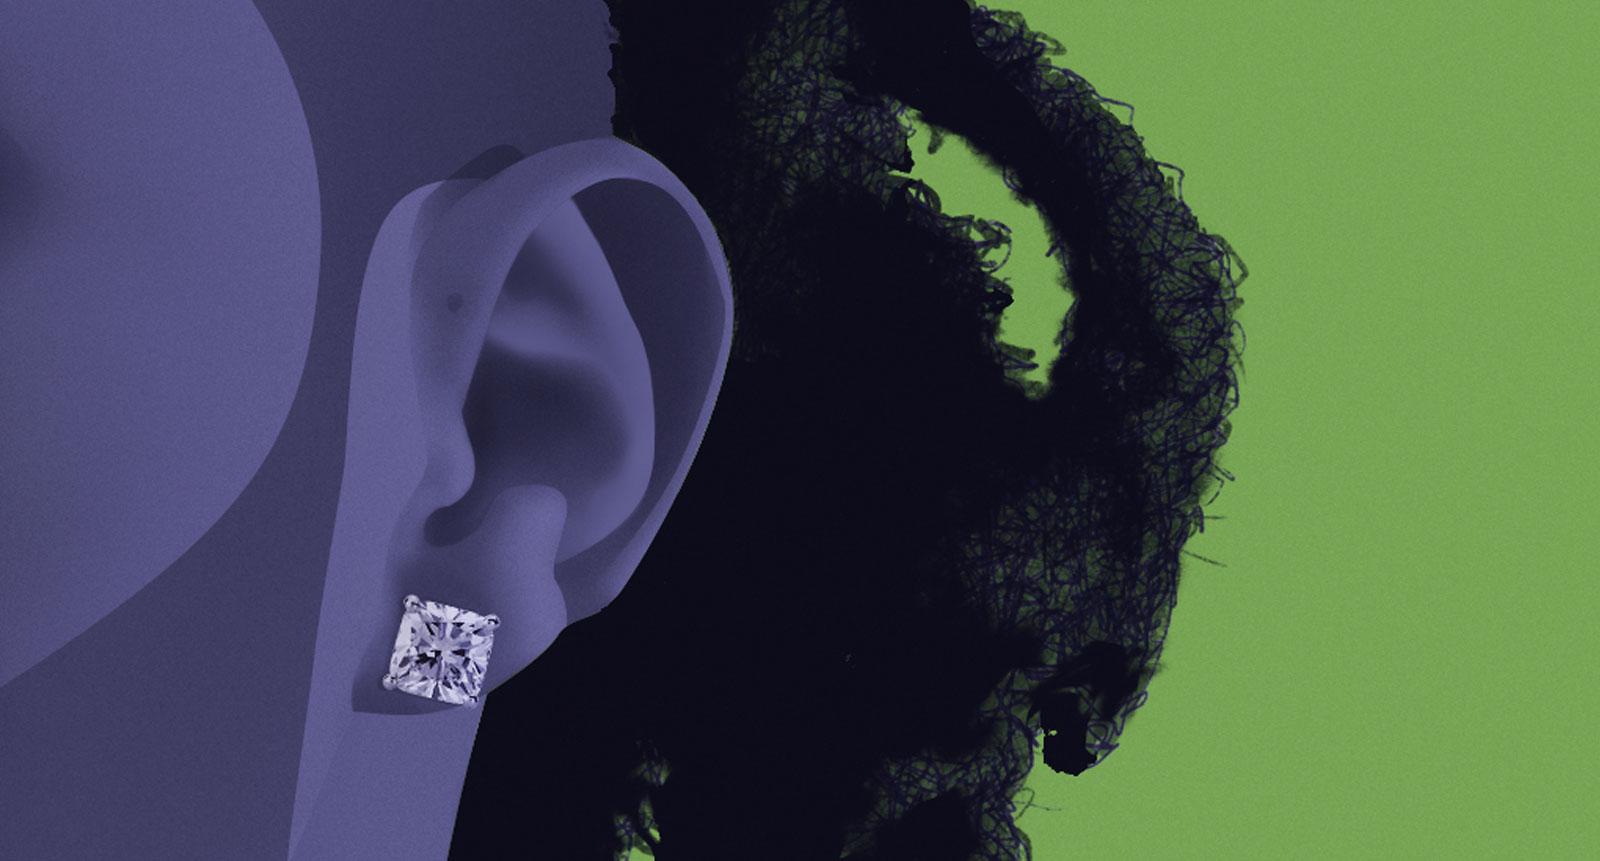 The Weeknd Zoom on Ear | crystalpulse.co.uk